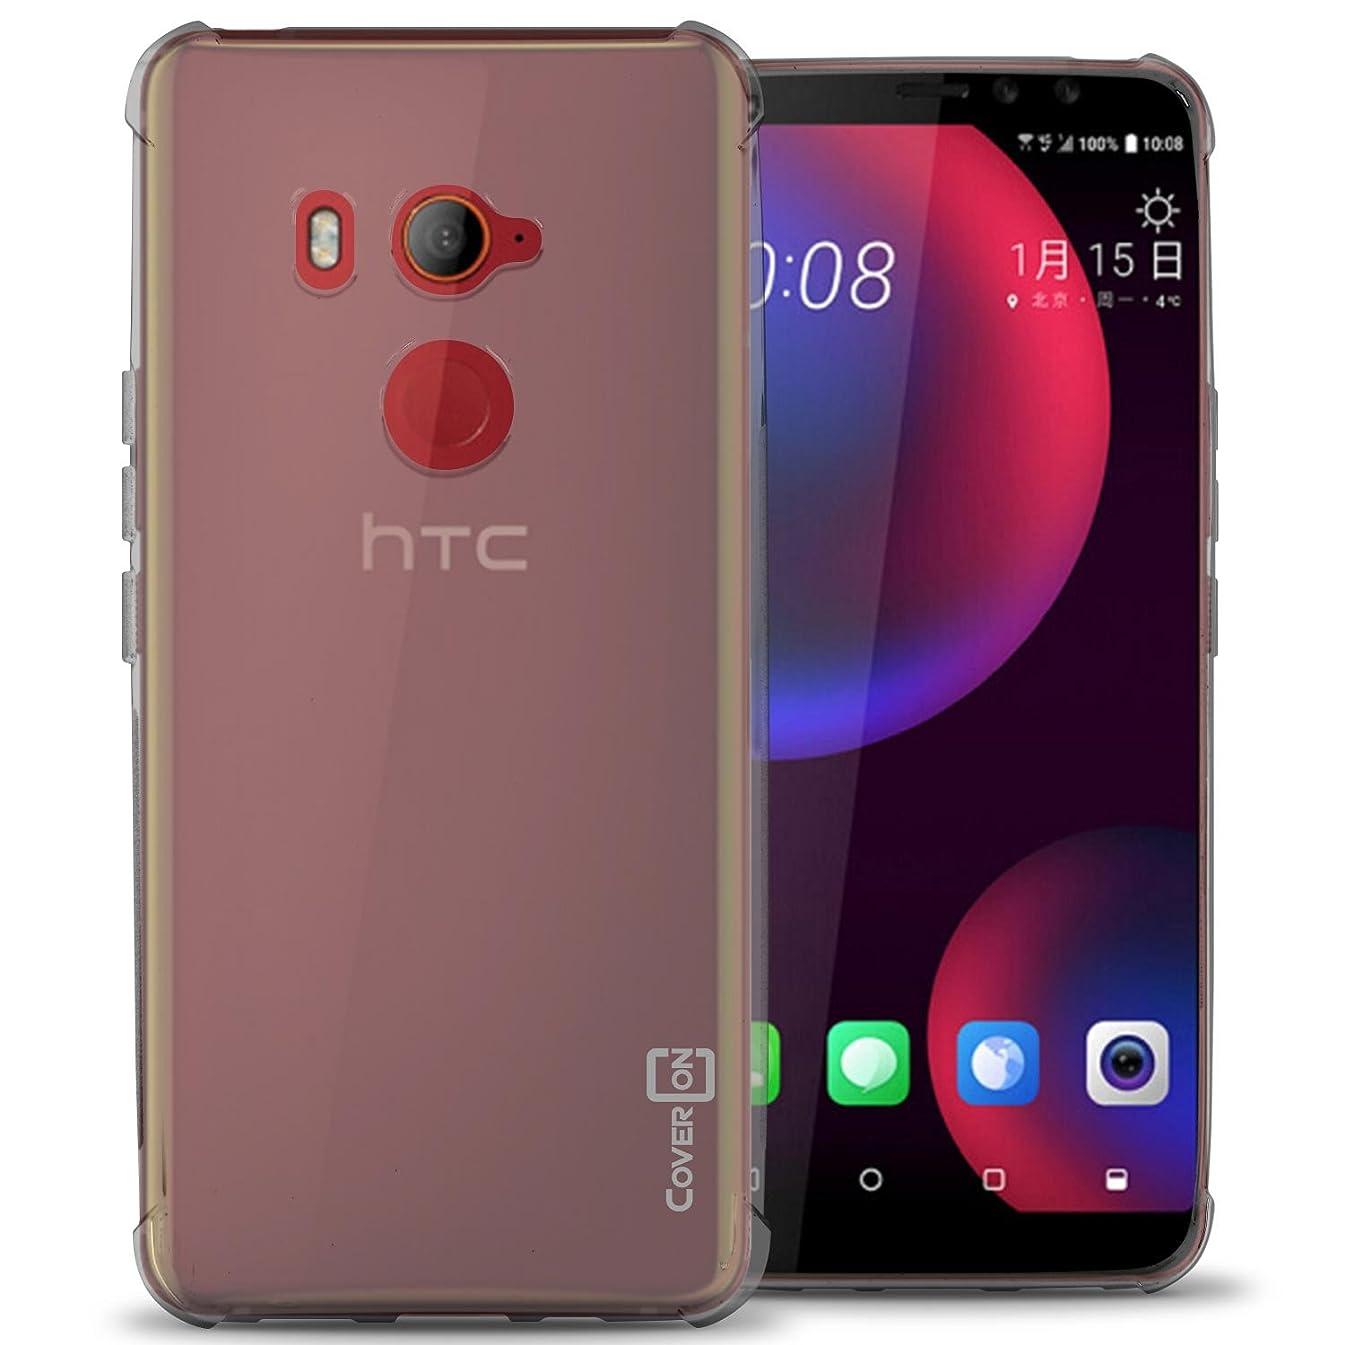 HTC U11 Eyes Case, CoverON [FlexGuard Series] Premium Slim Fit TPU Rubber Phone Cover for HTC U11 Eyes (HTC Edge Sense Compatible) - HD Clear